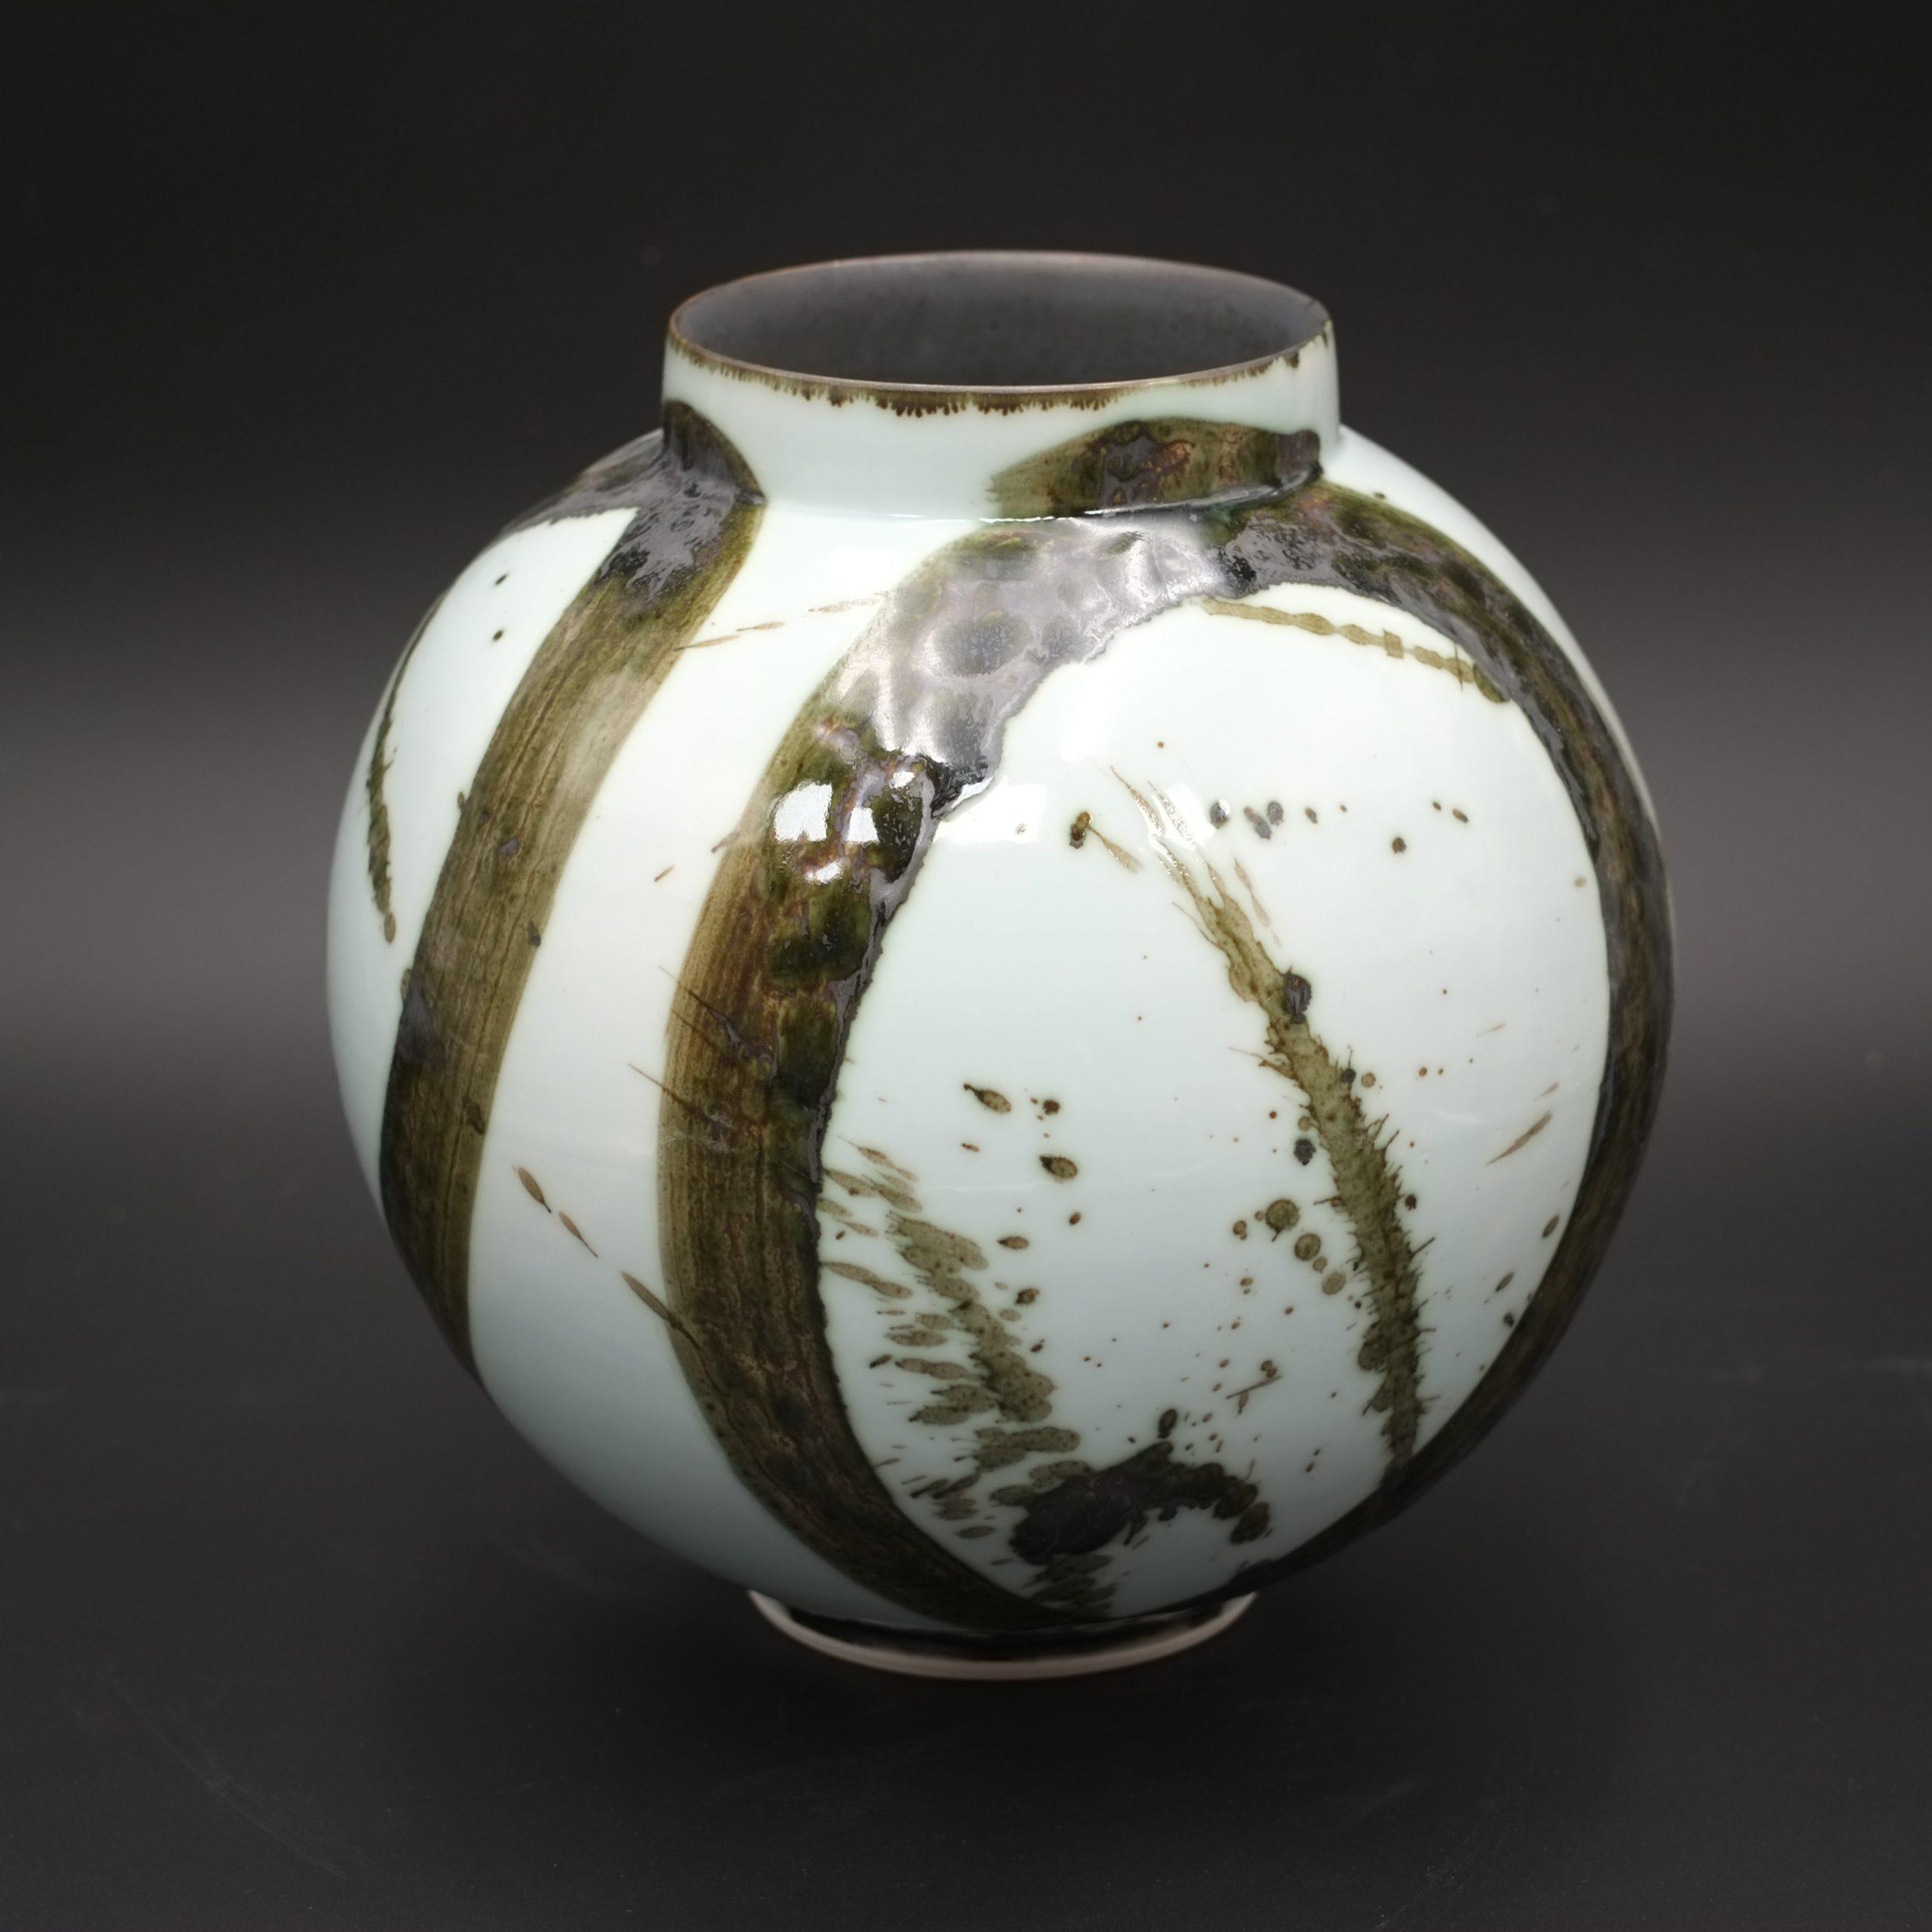 Tricia Thom. Moon Jar